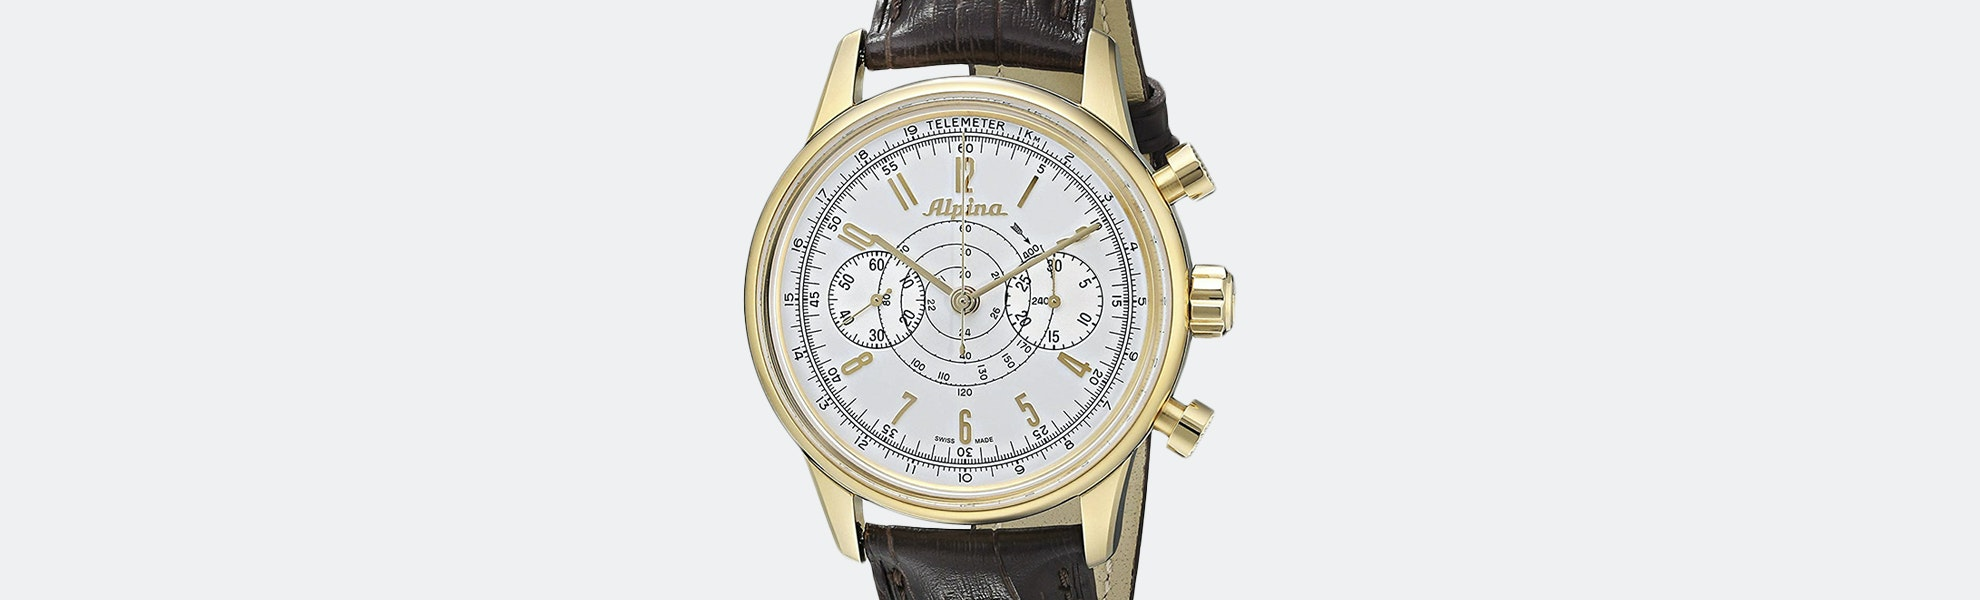 Alpina 130 Heritage Pilot Automatic Watch